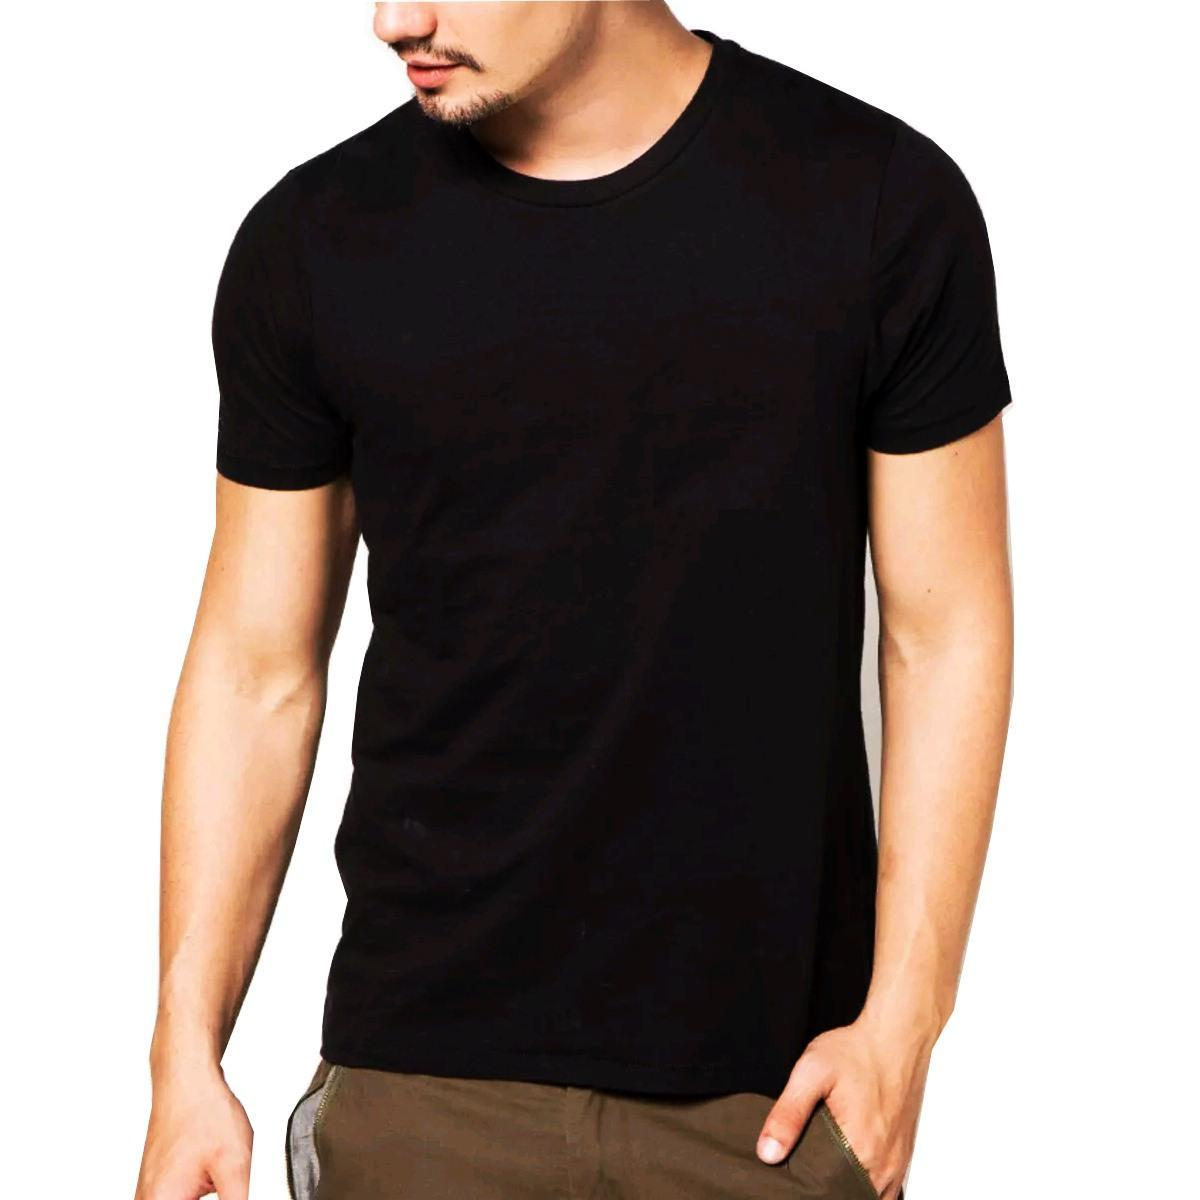 Buy Sell Cheapest Premium Kaos T Best Quality Product Deals Save Allepo Silungkang Shop Pria Polos Distro Terbaru Keren Murah Tumblr Tee Dewasa Hitam